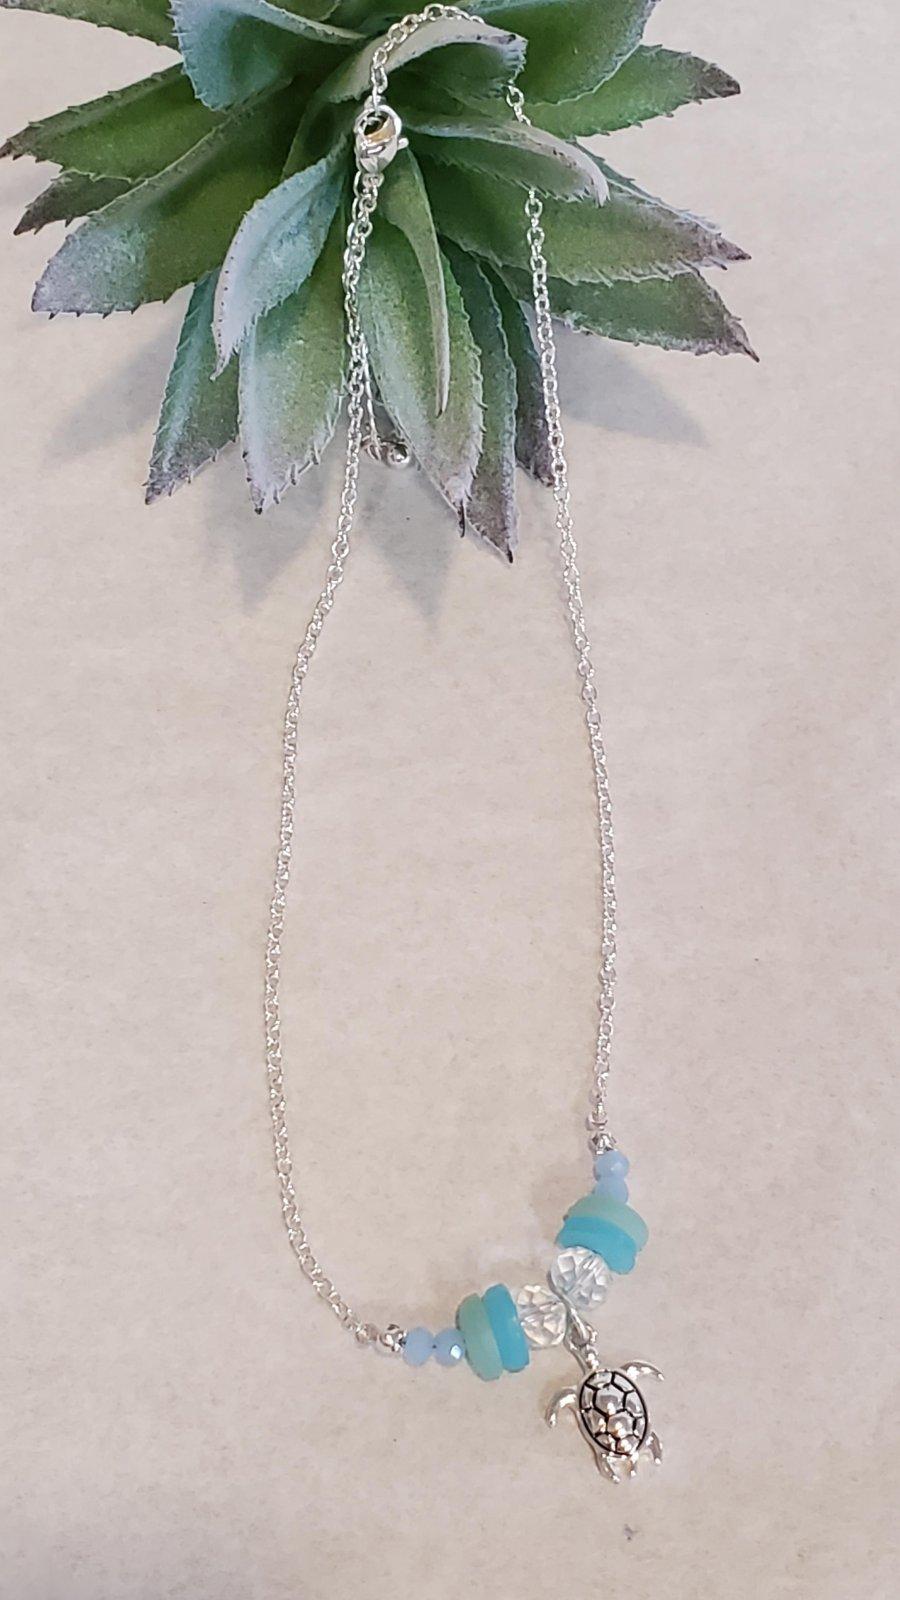 Under the Sea Necklaces 14.98 Each